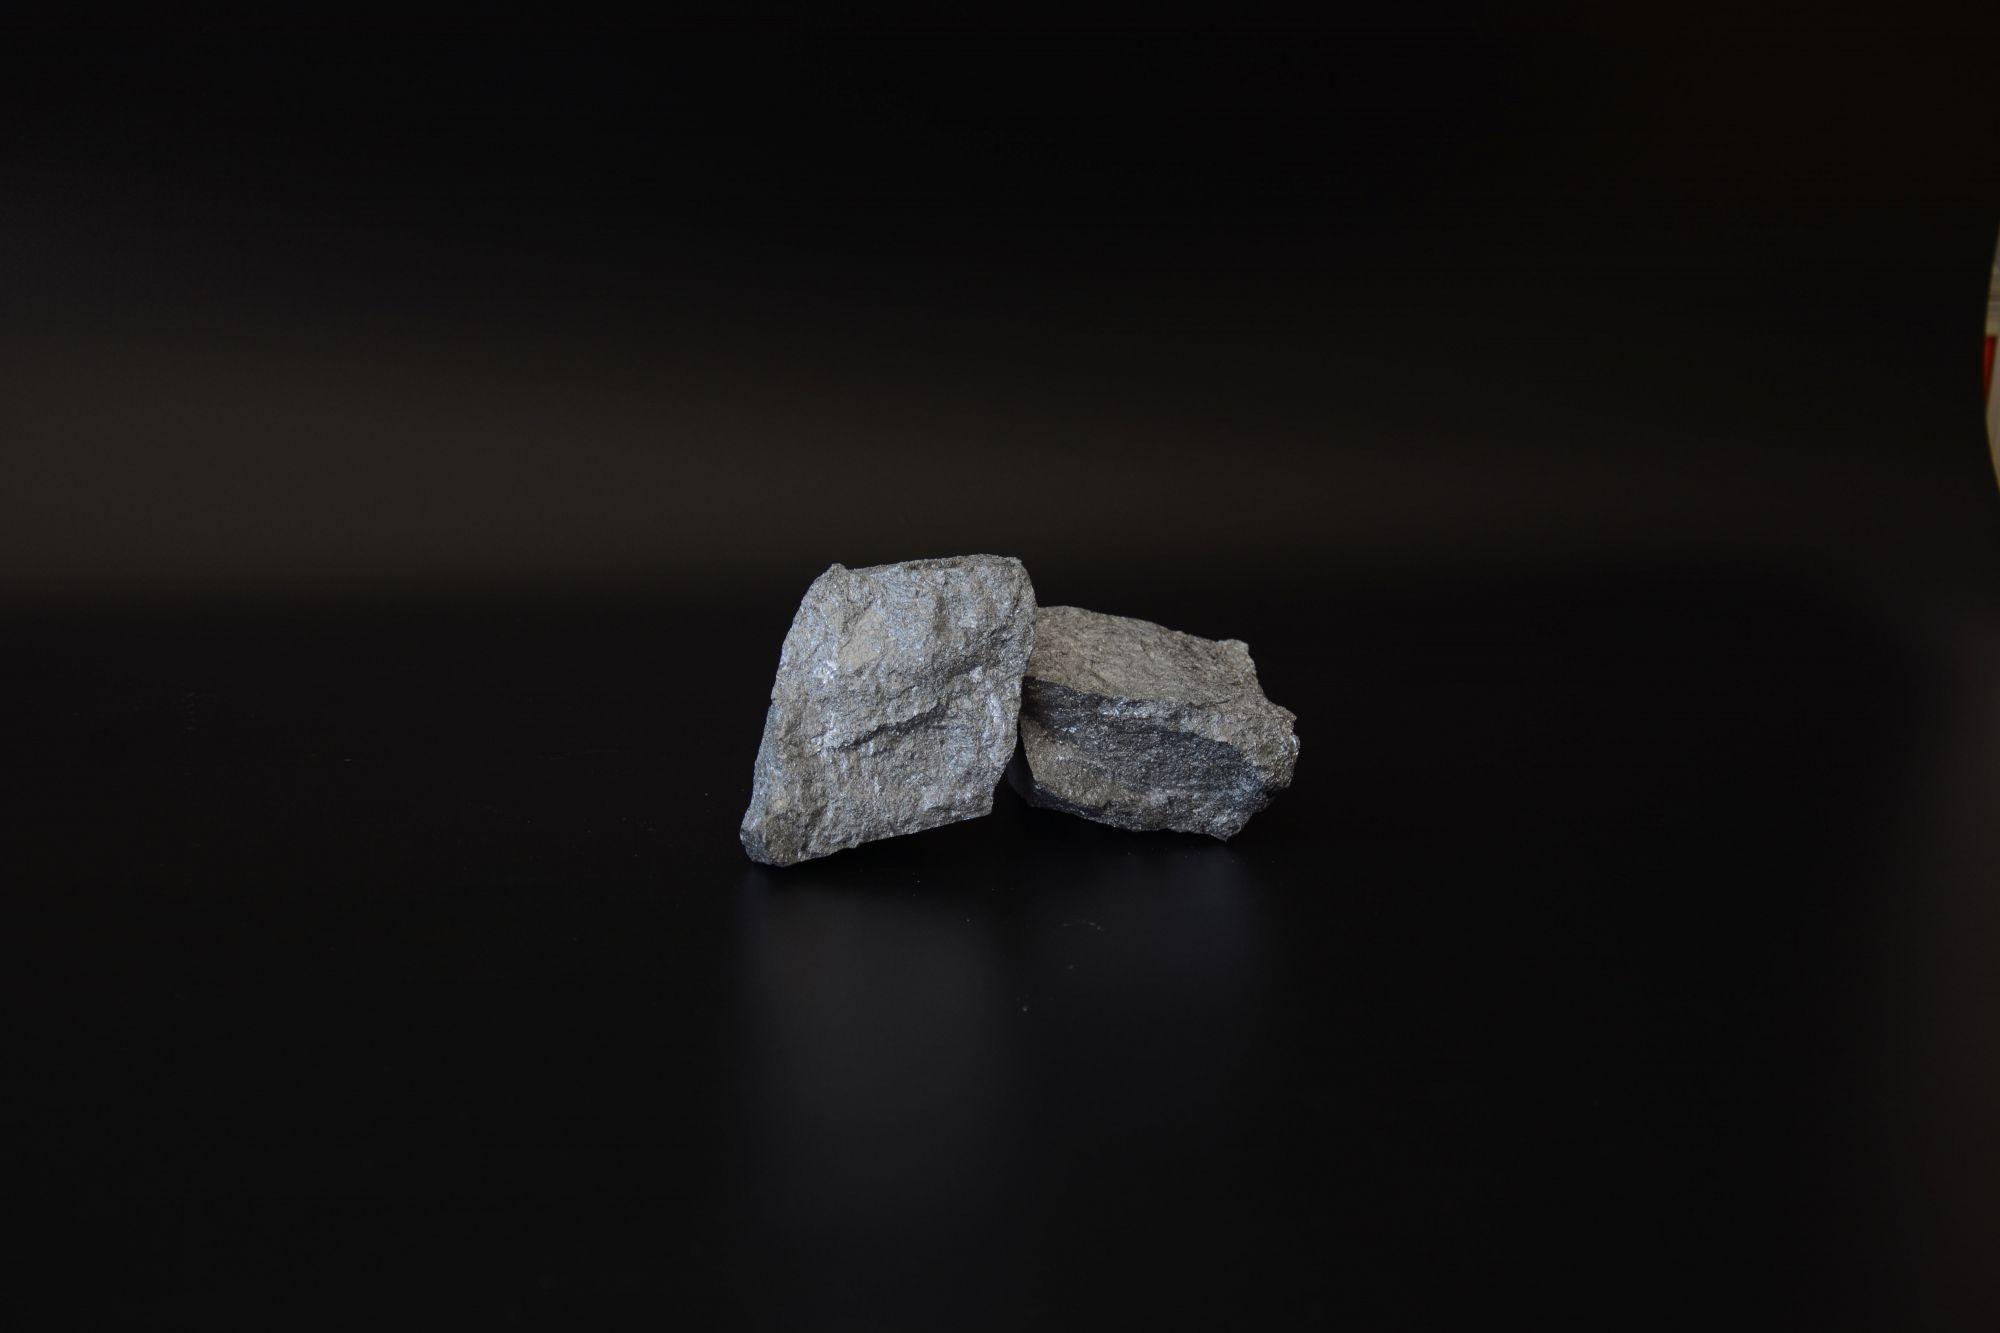 Zirconium - Zirconium